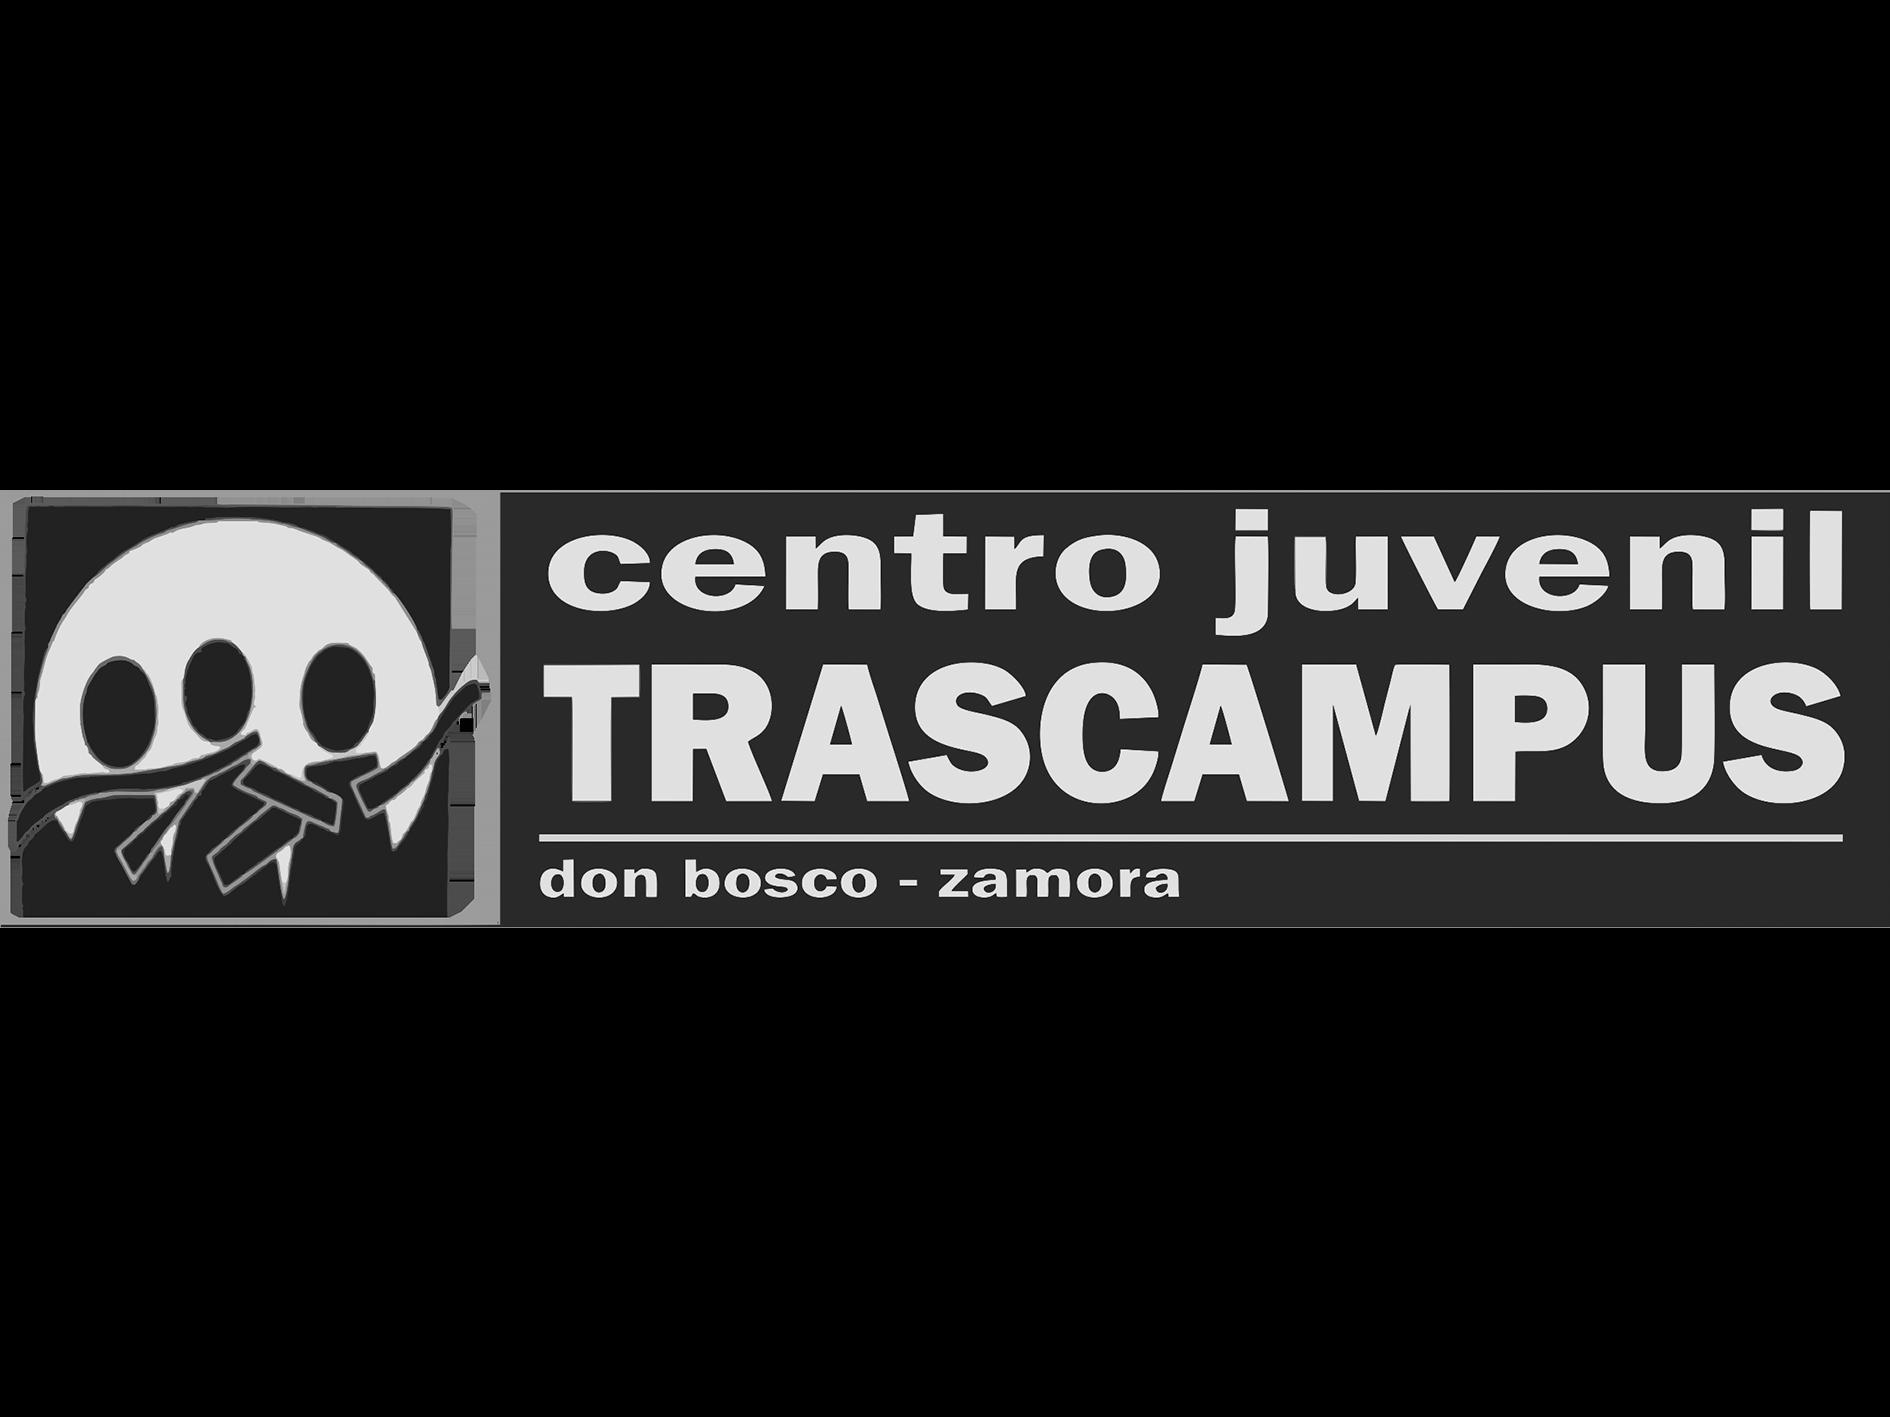 Trascampus